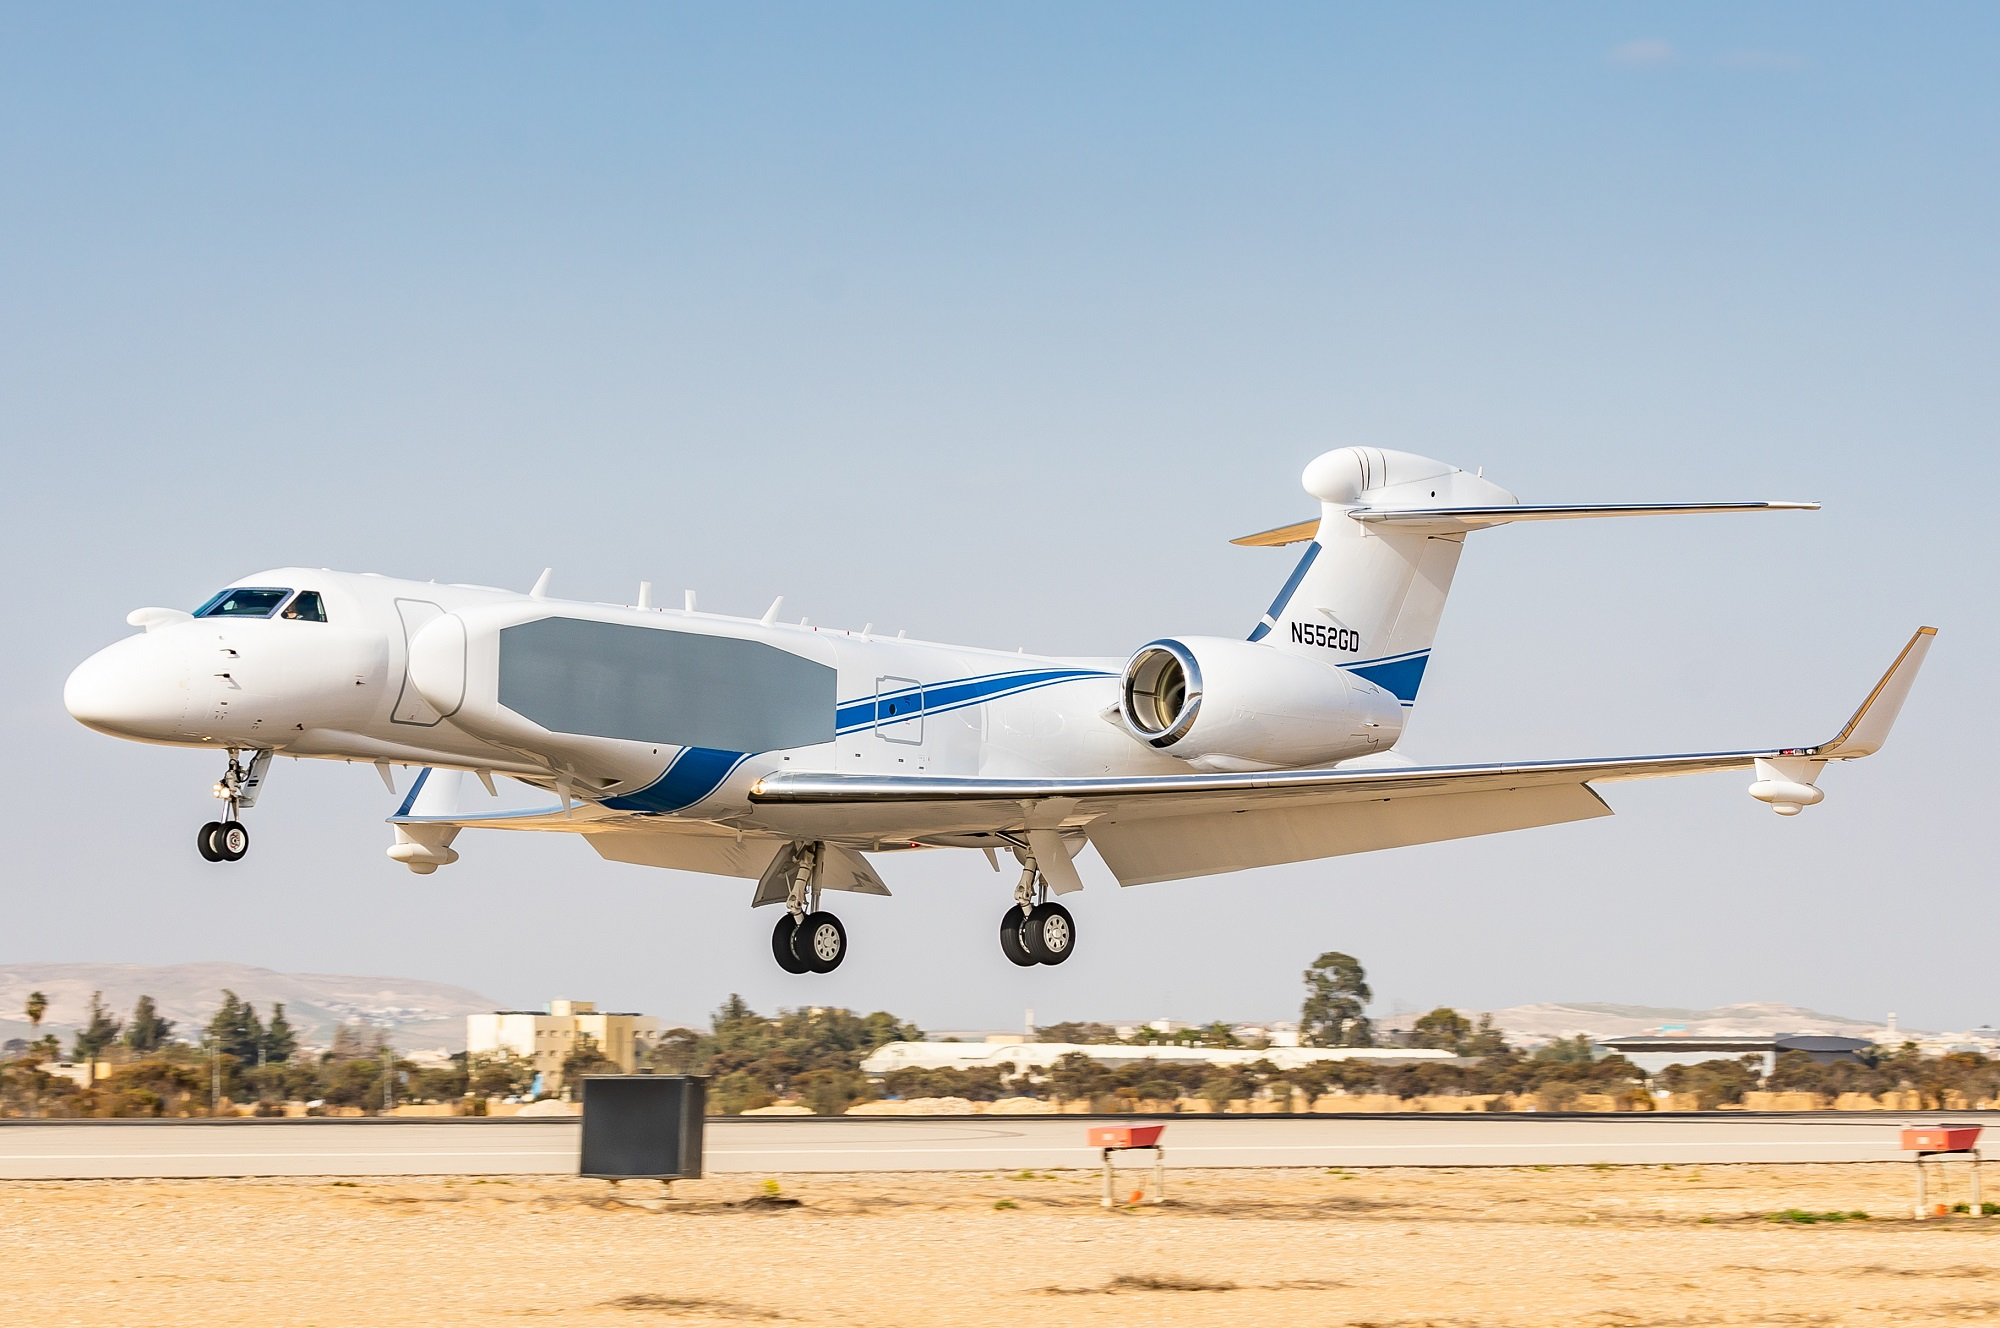 Israel Air Force Receives Oron Reconnaissance and Surveillance Aircraft